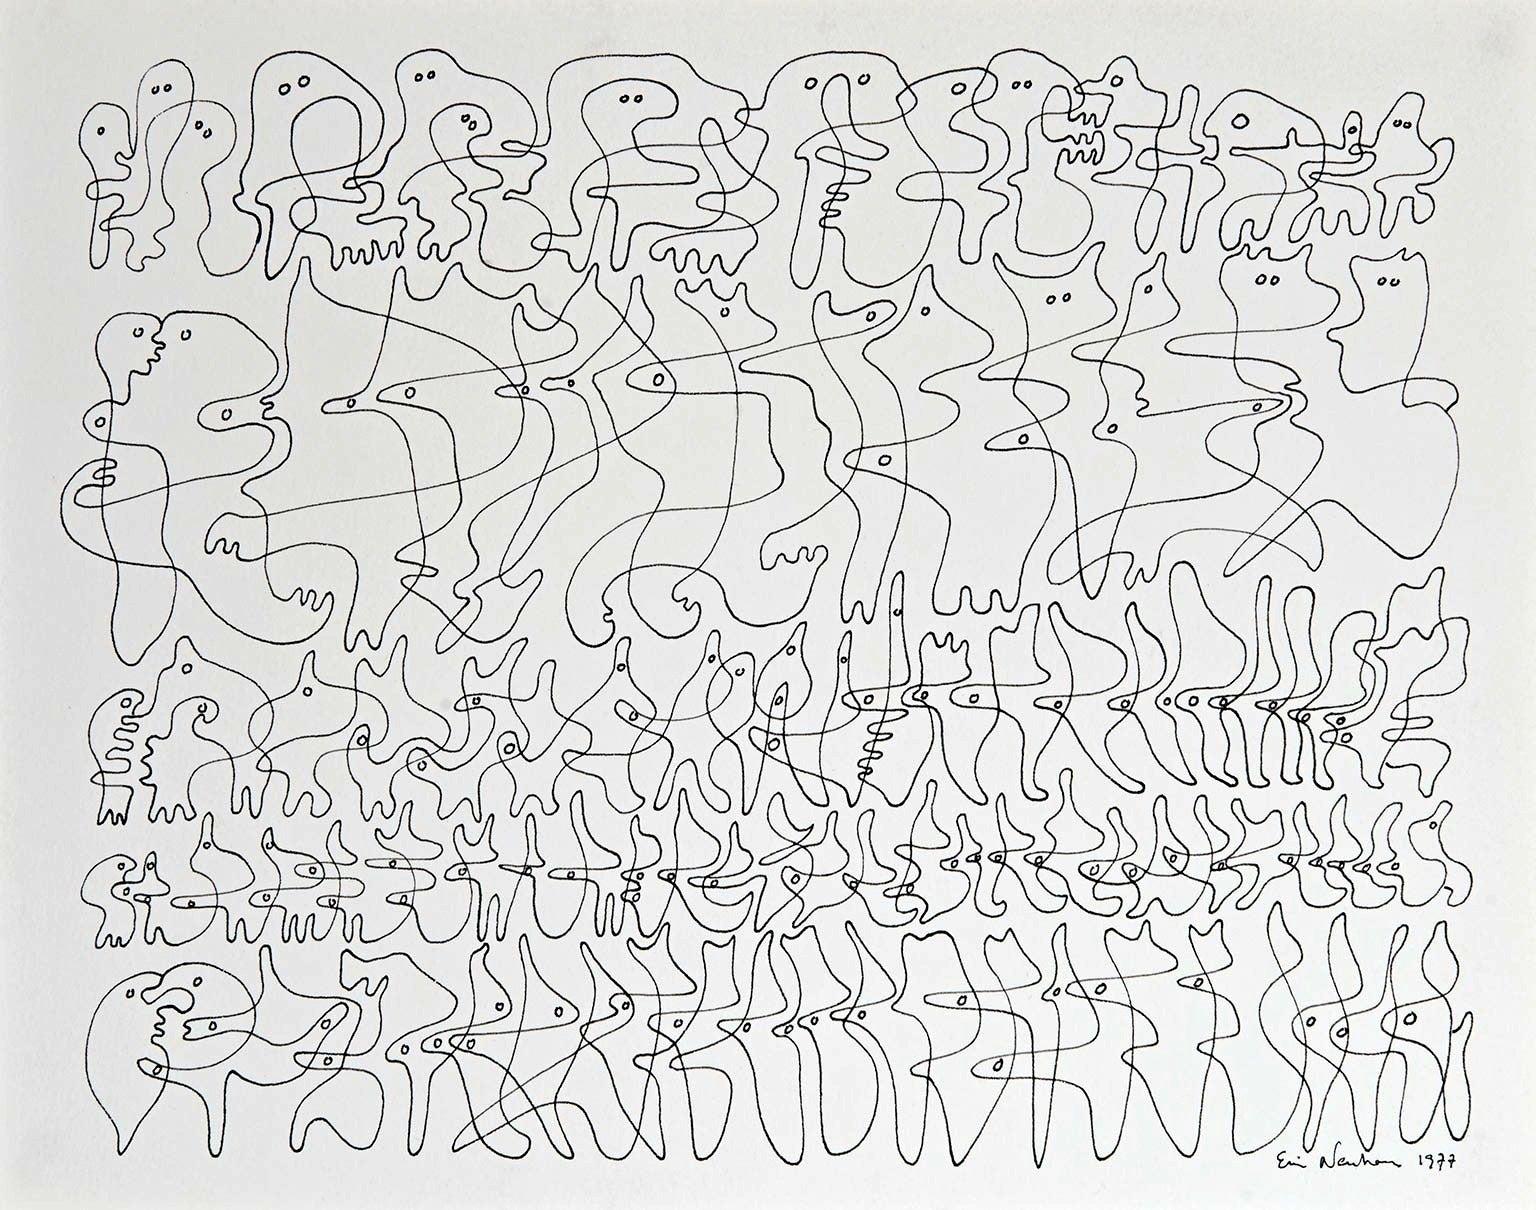 Drawing by Ervin Neuhaus